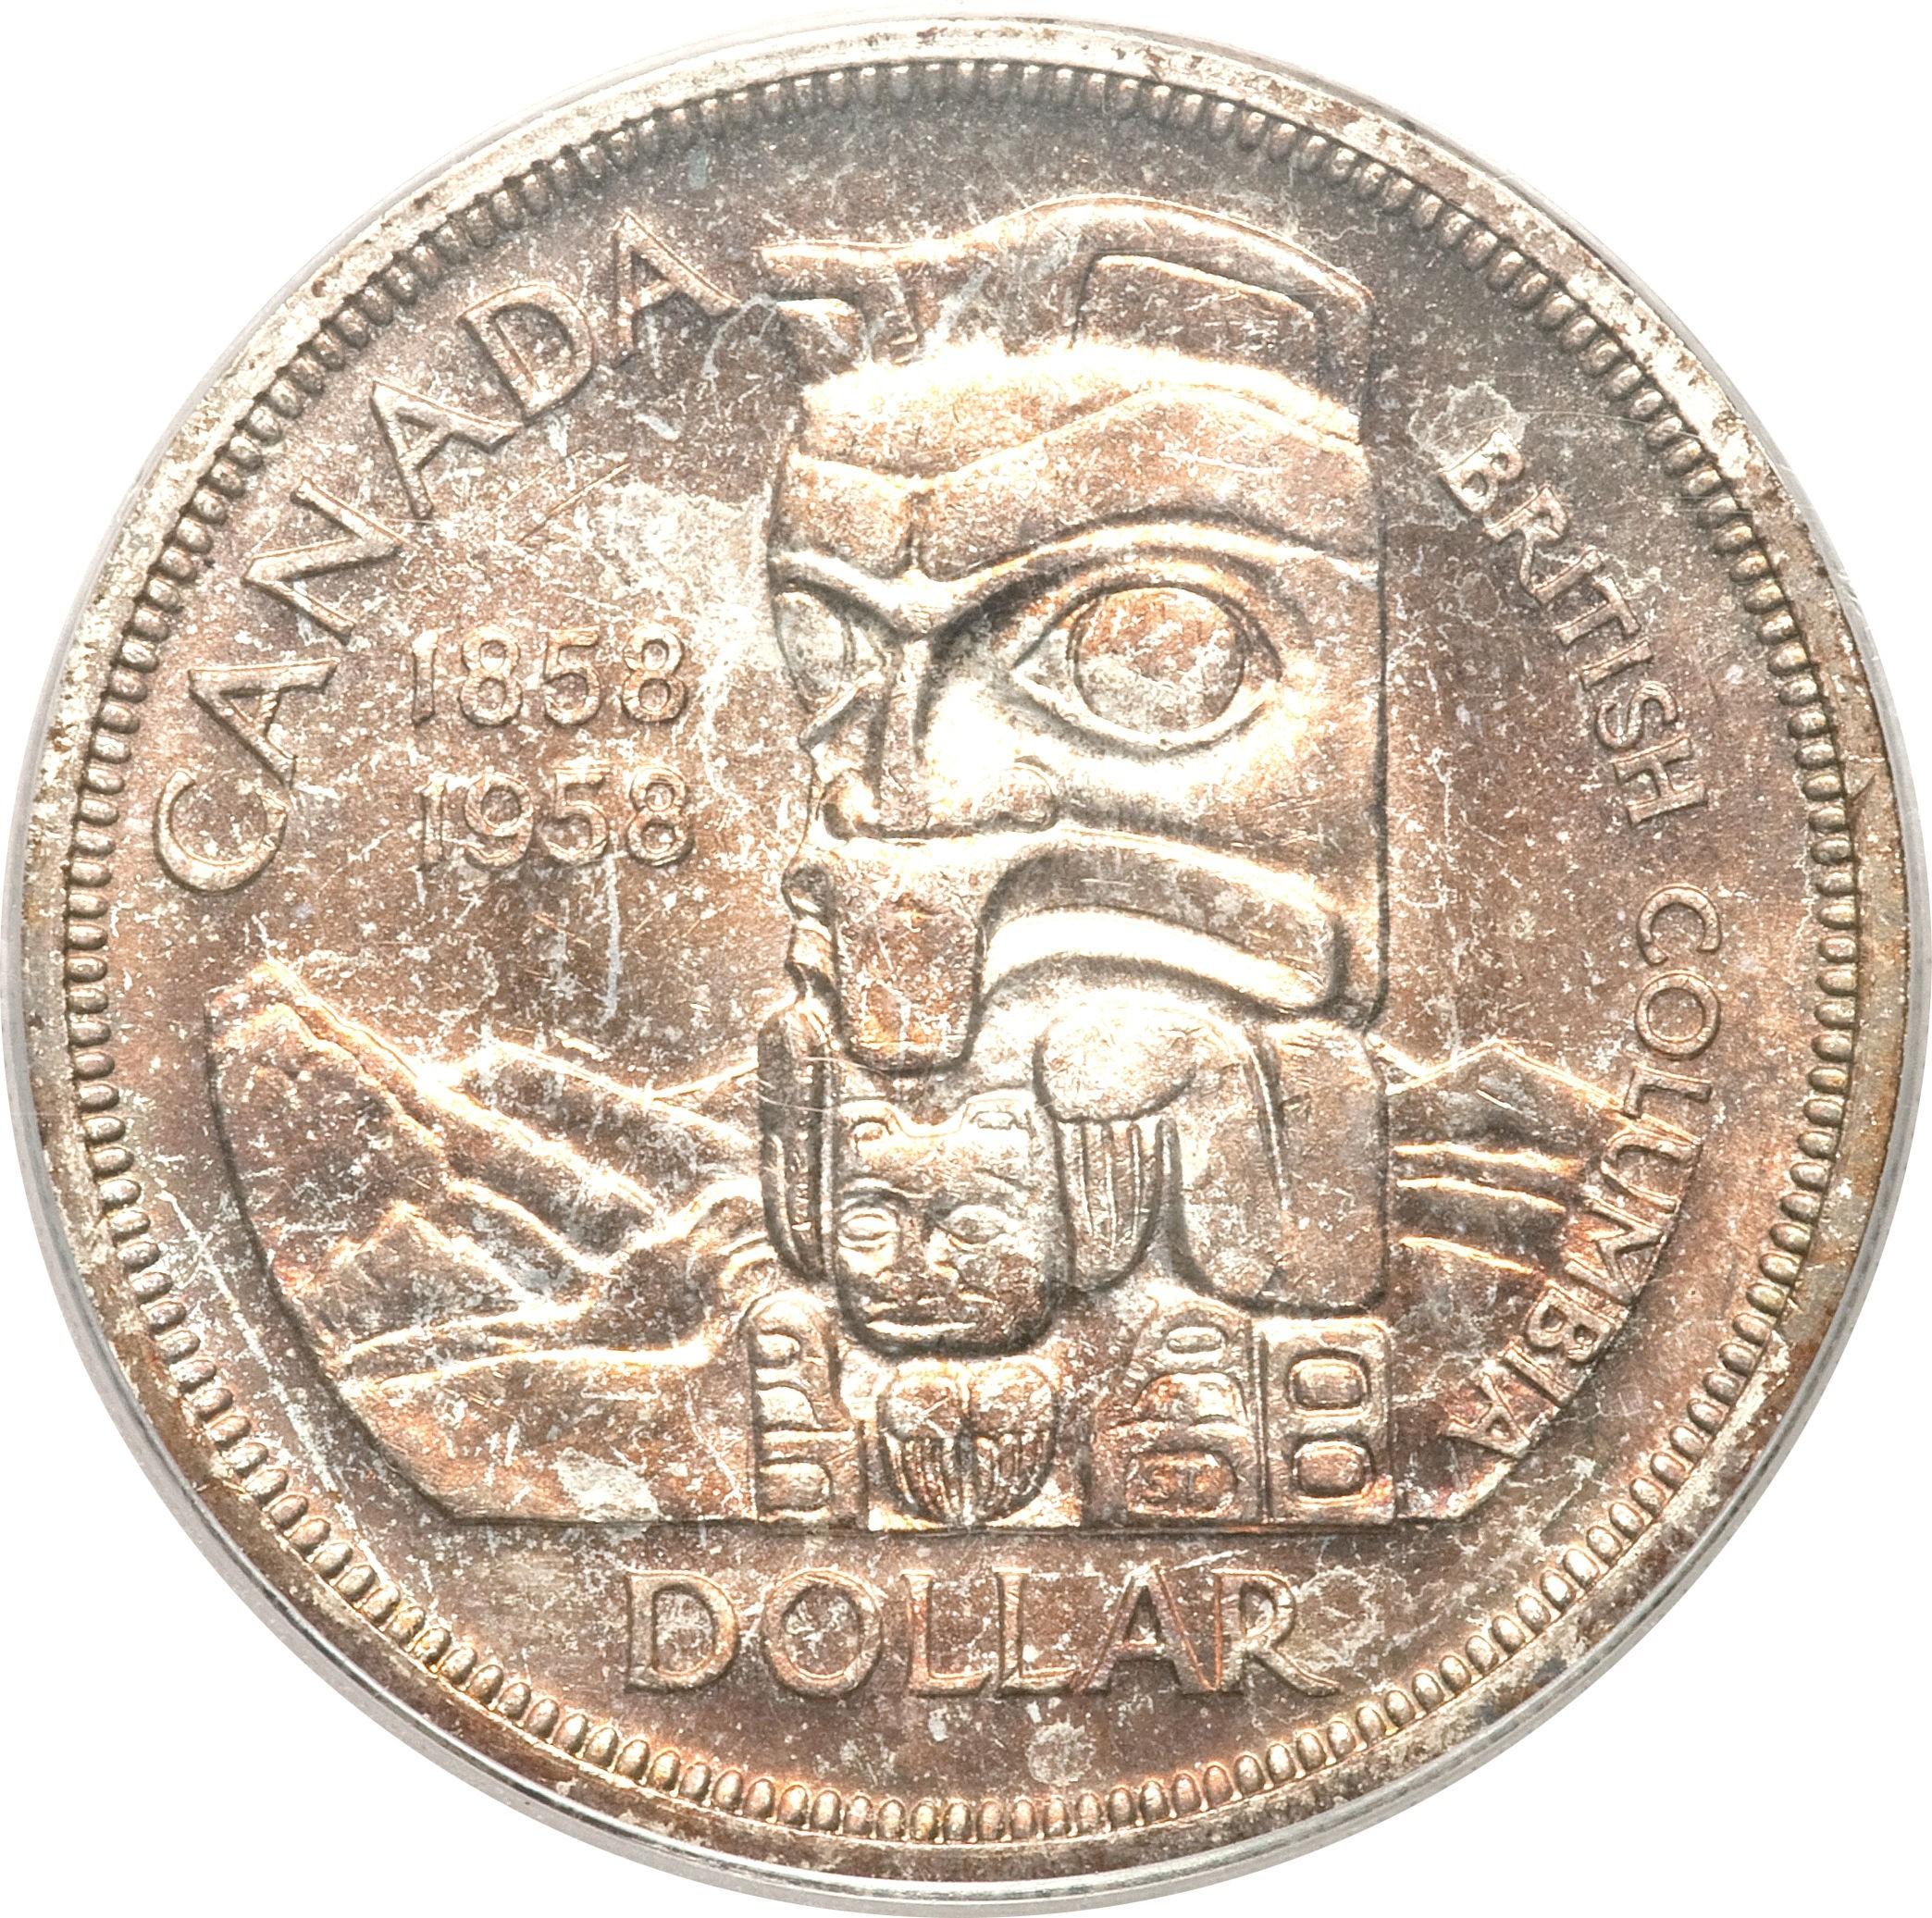 Canada 1 Dollar (1958 Elizabeth II British Columbia)